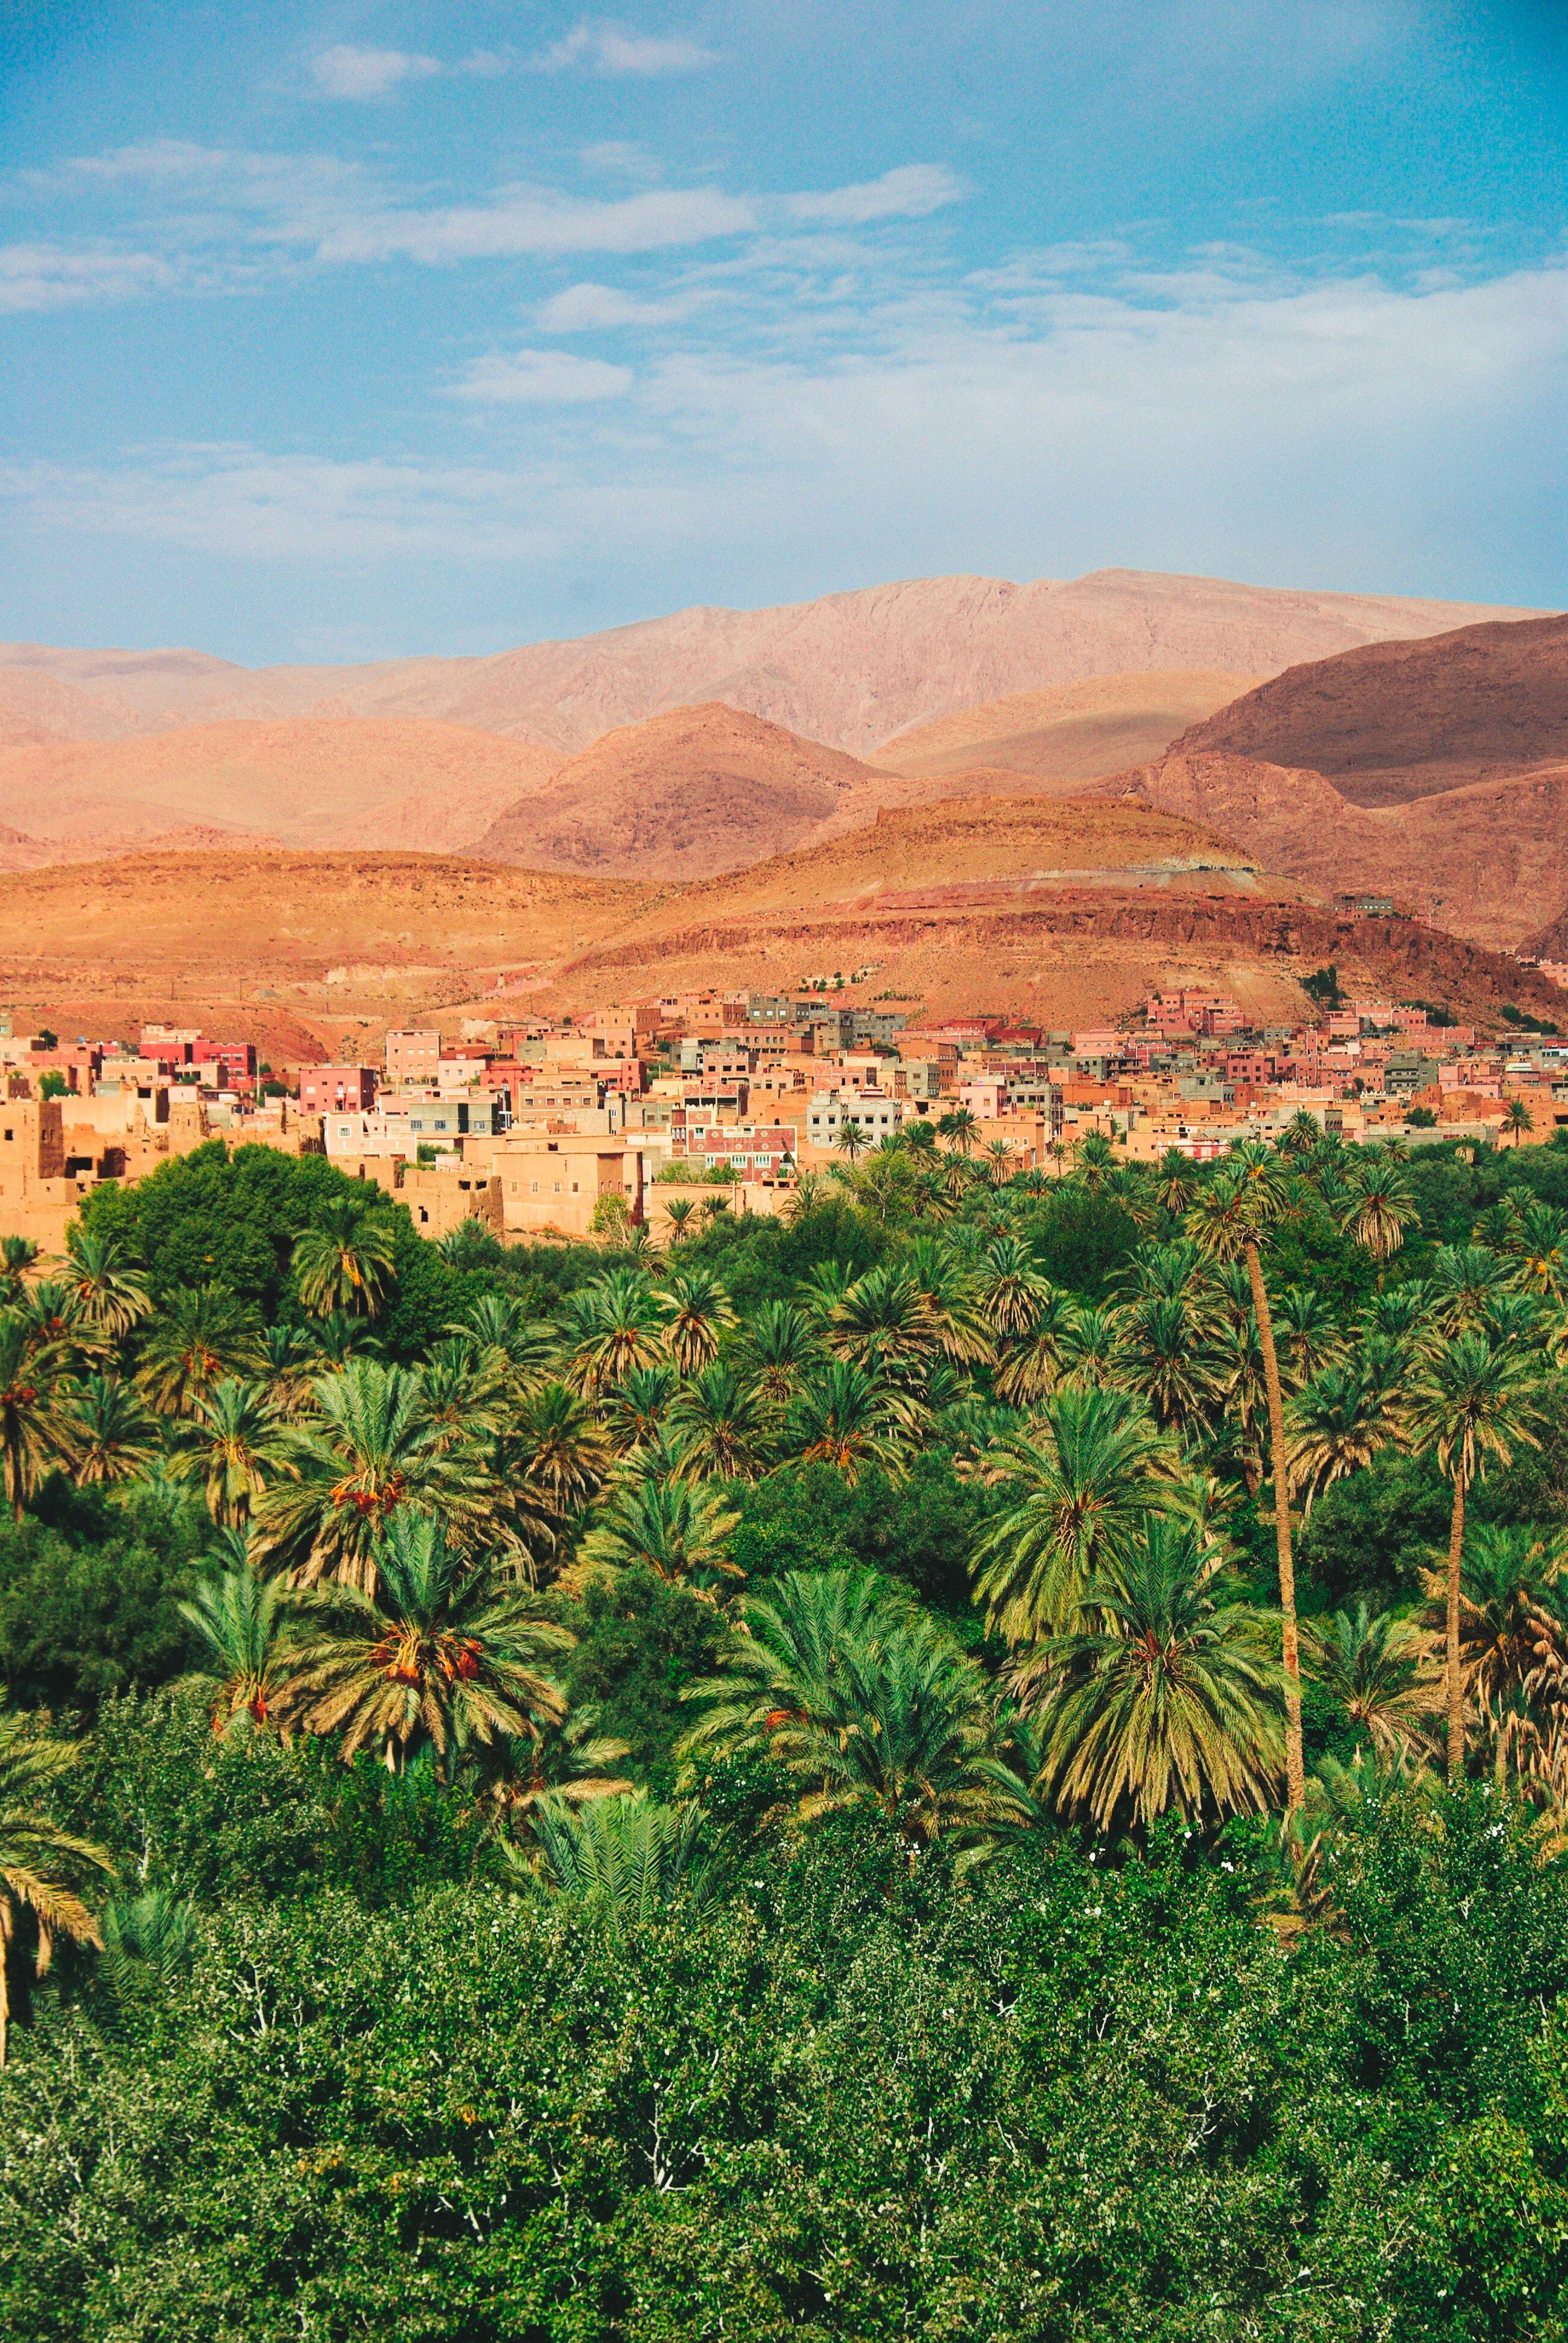 Photo by Mari Potter  #marokko #morocco #afrika #noordafrika #reizen #travel #vakantie #stedentrip